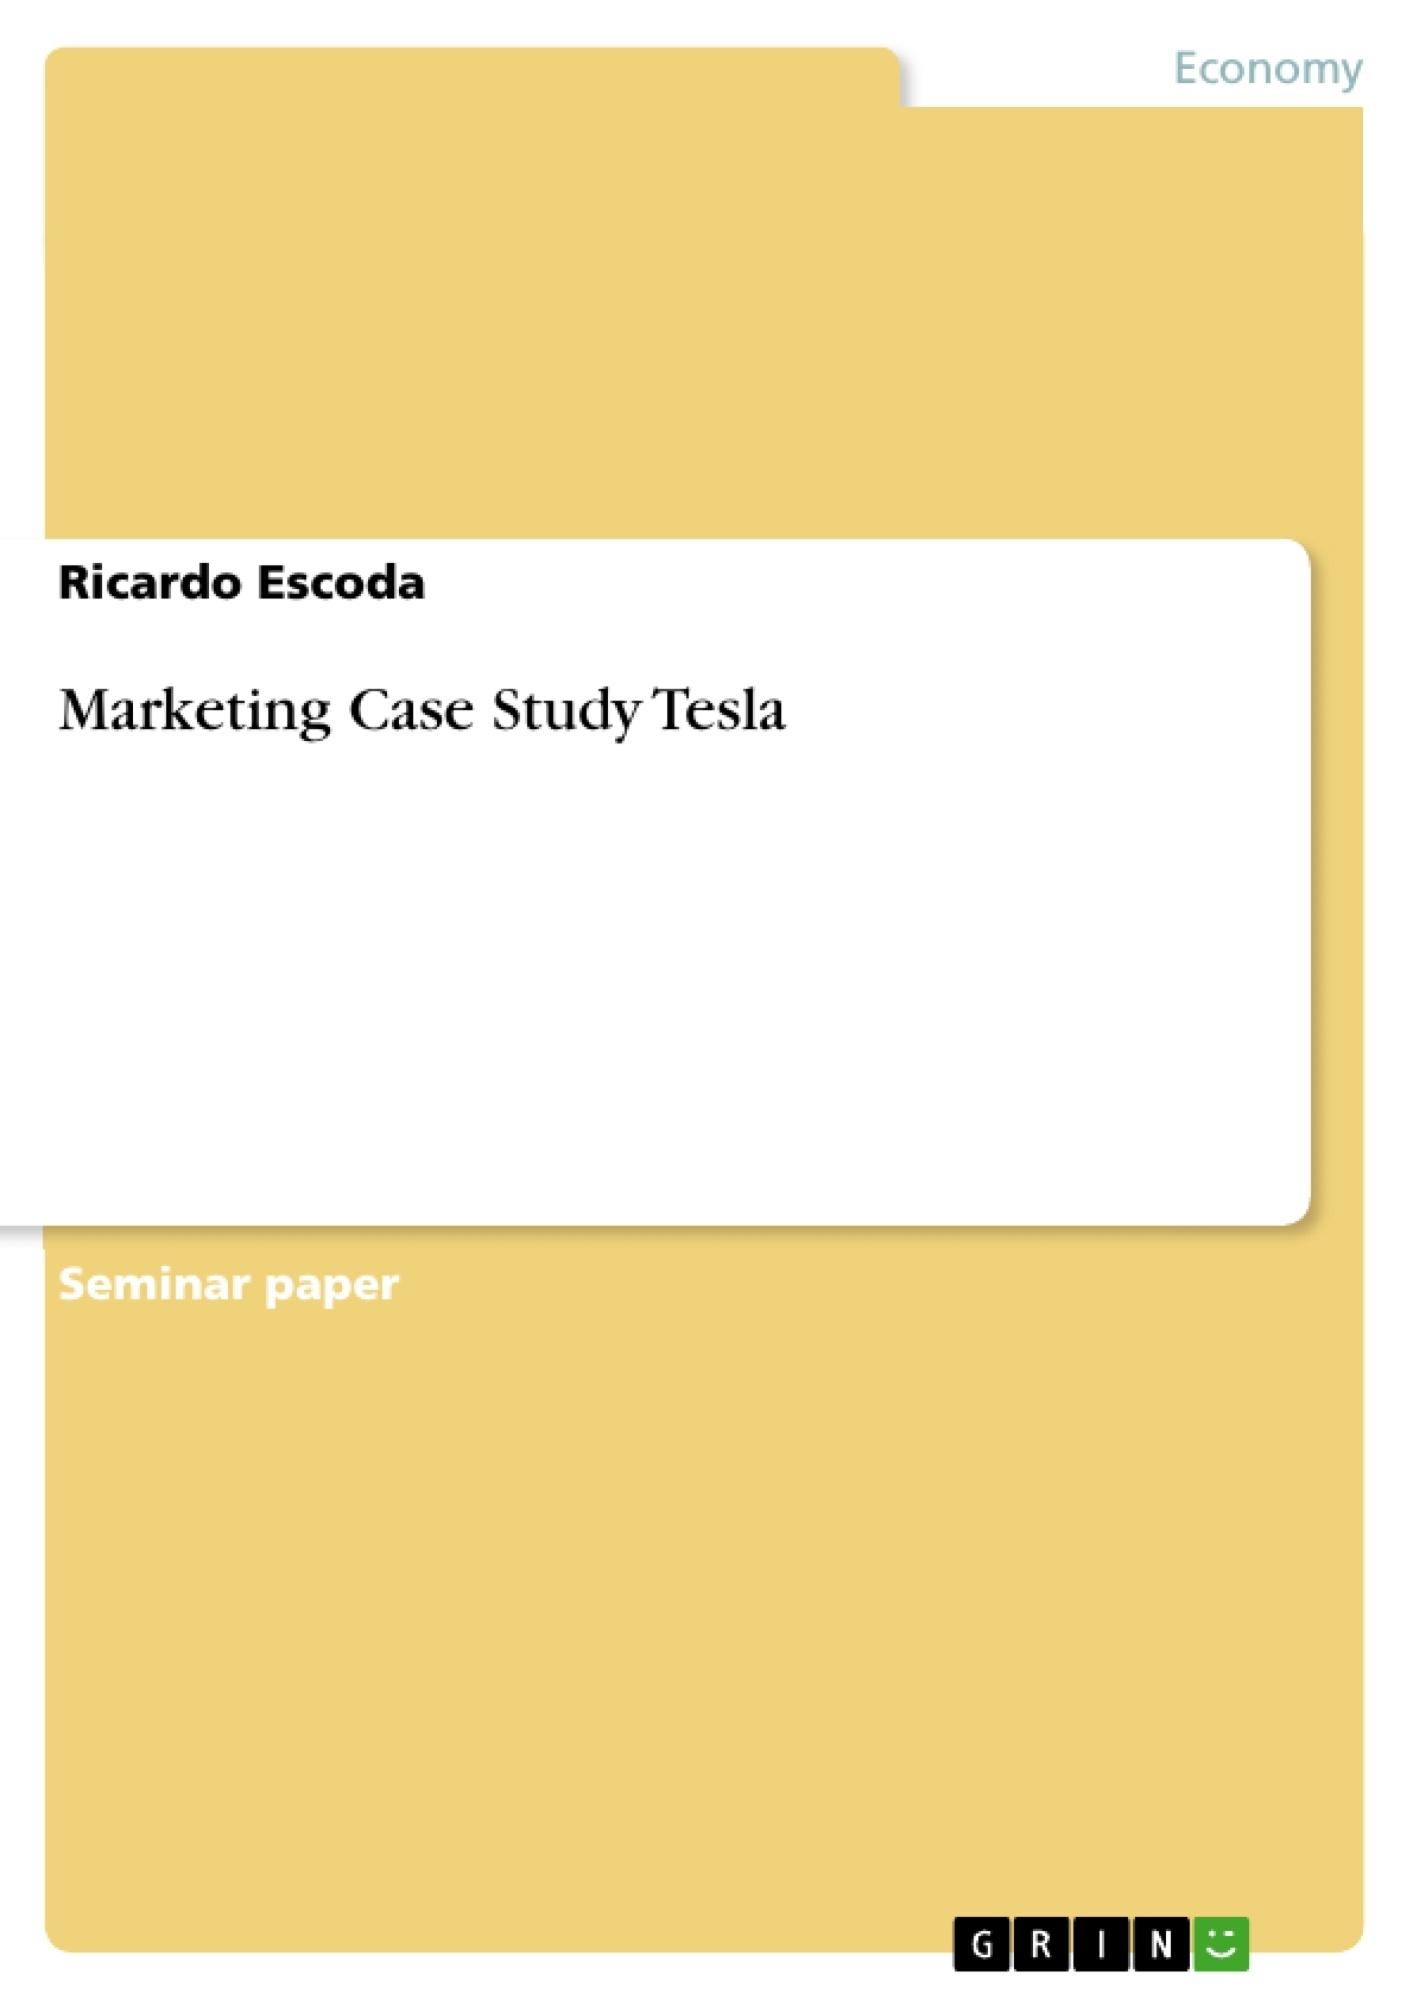 Title: Marketing Case Study Tesla